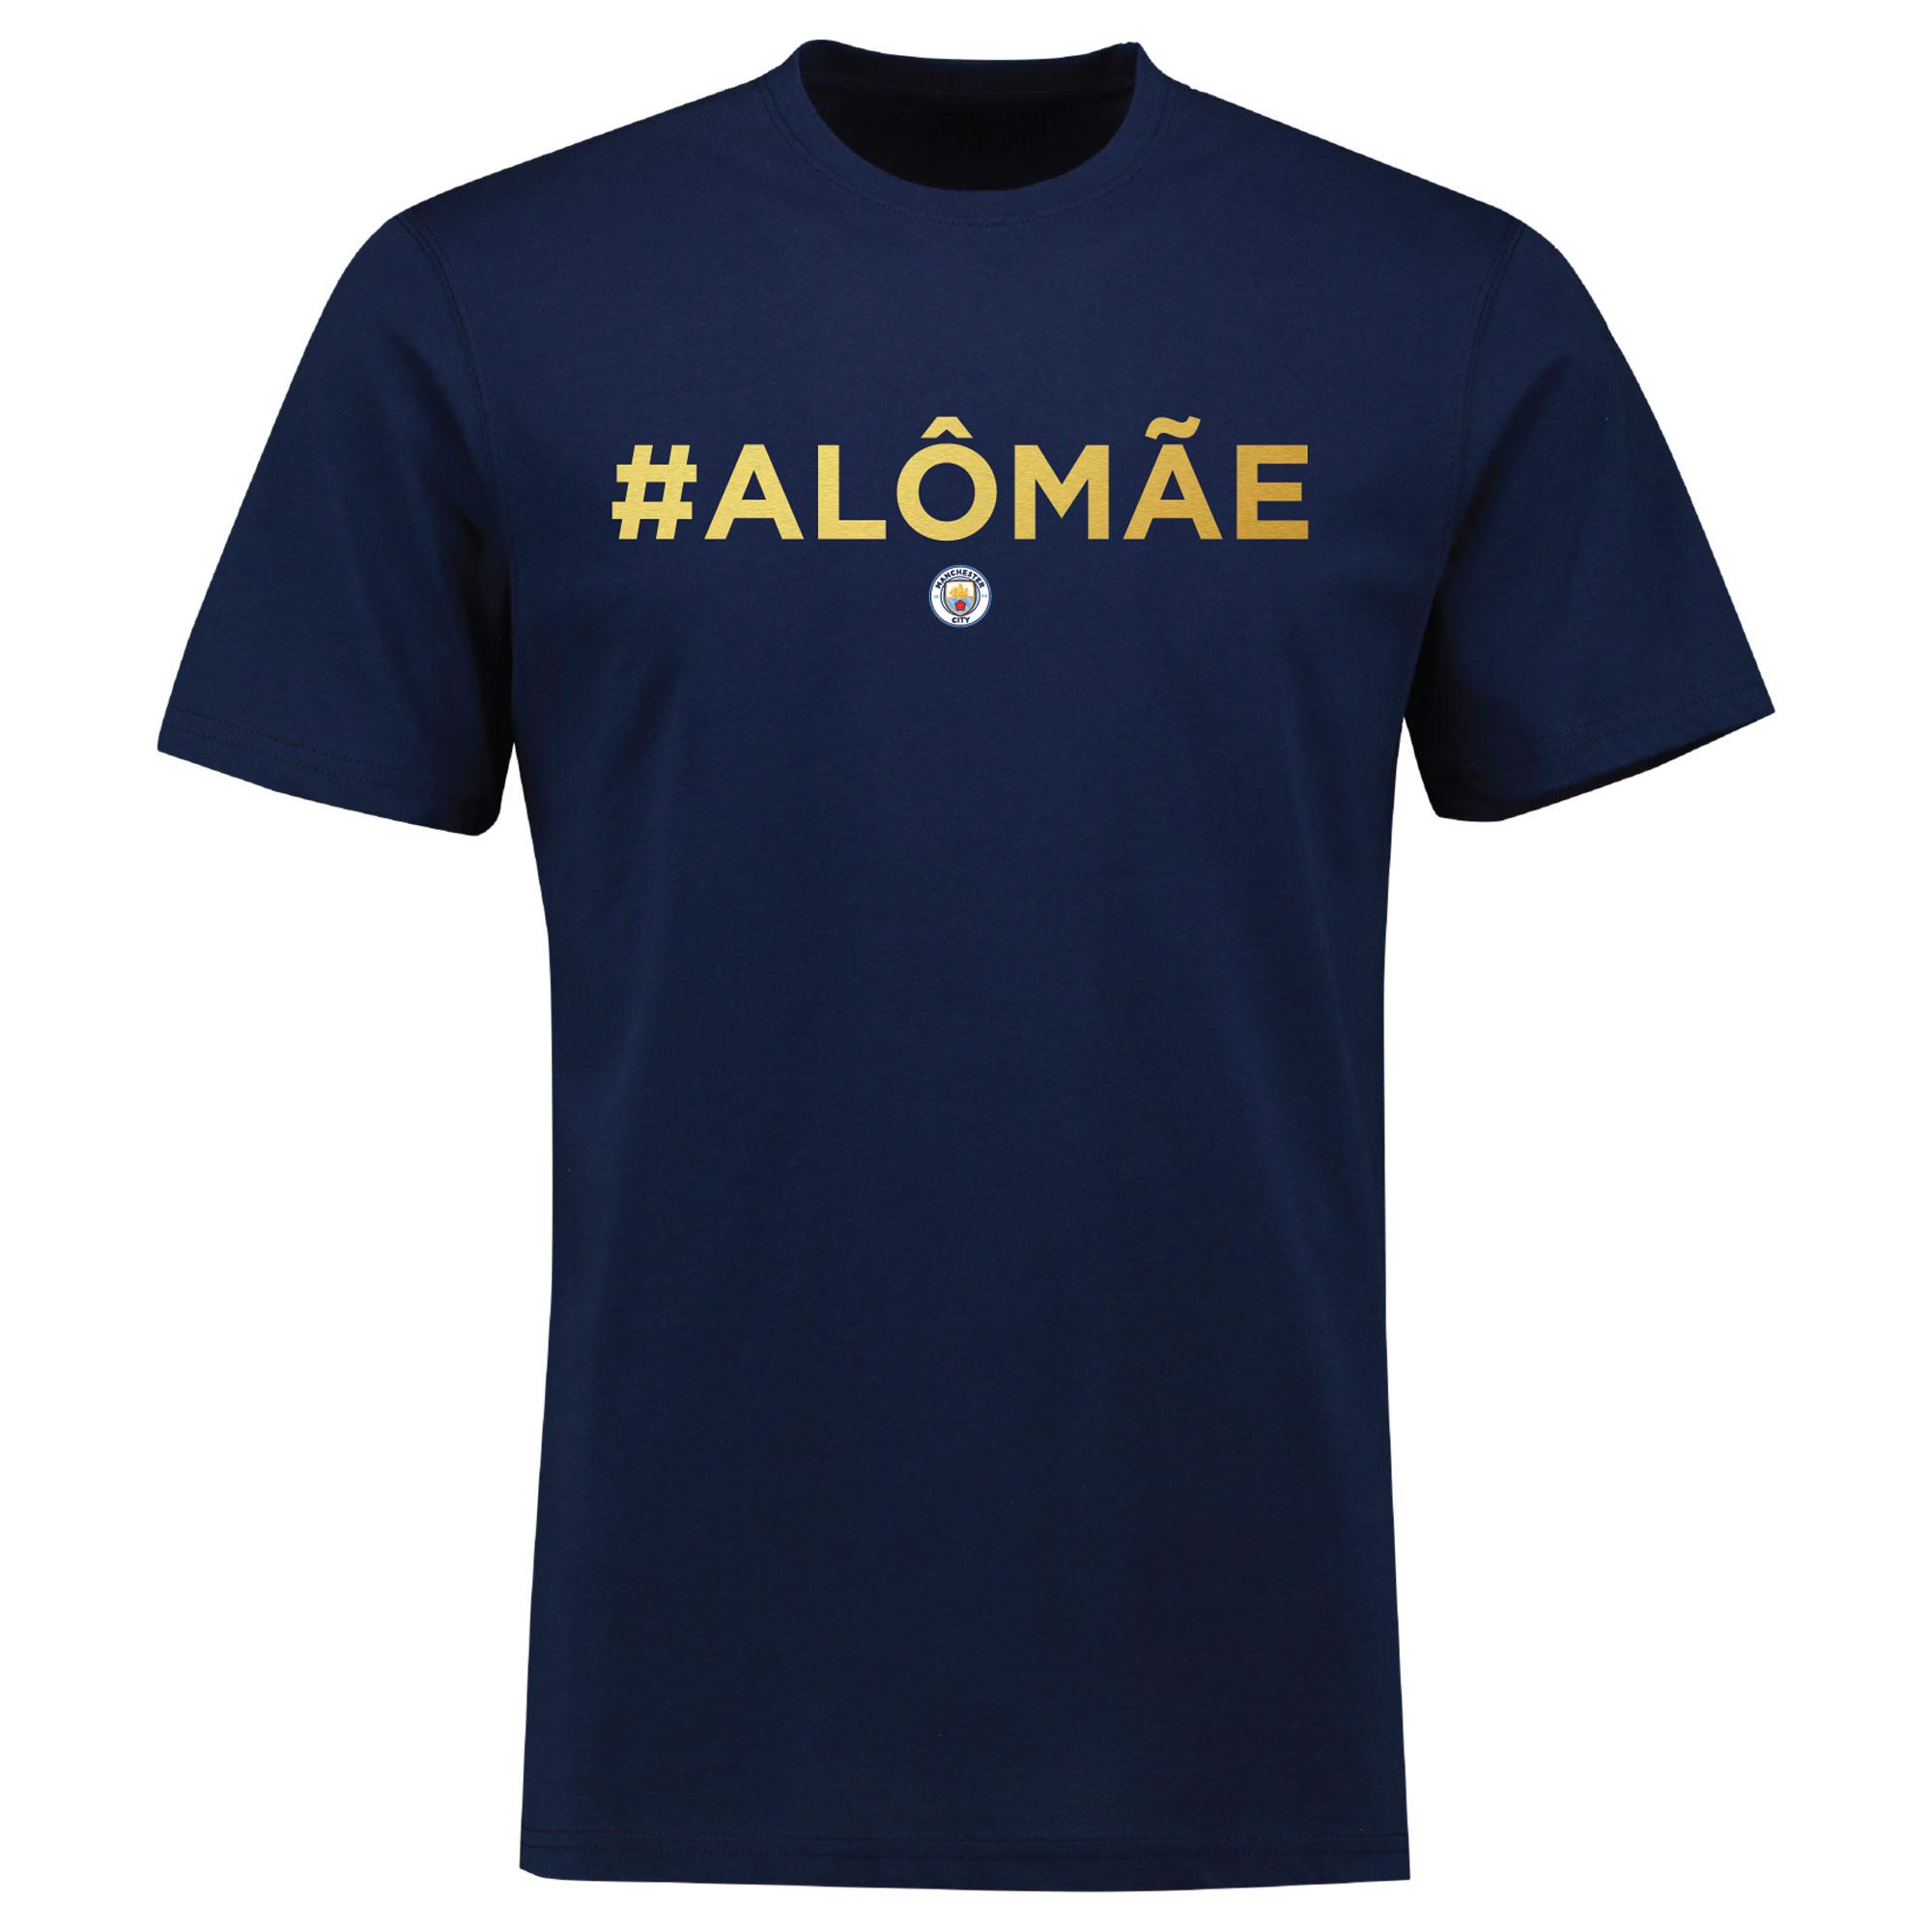 Manchester City Gabriel Jesus ALO MAE Hashtag T Shirt - Womens - Navy